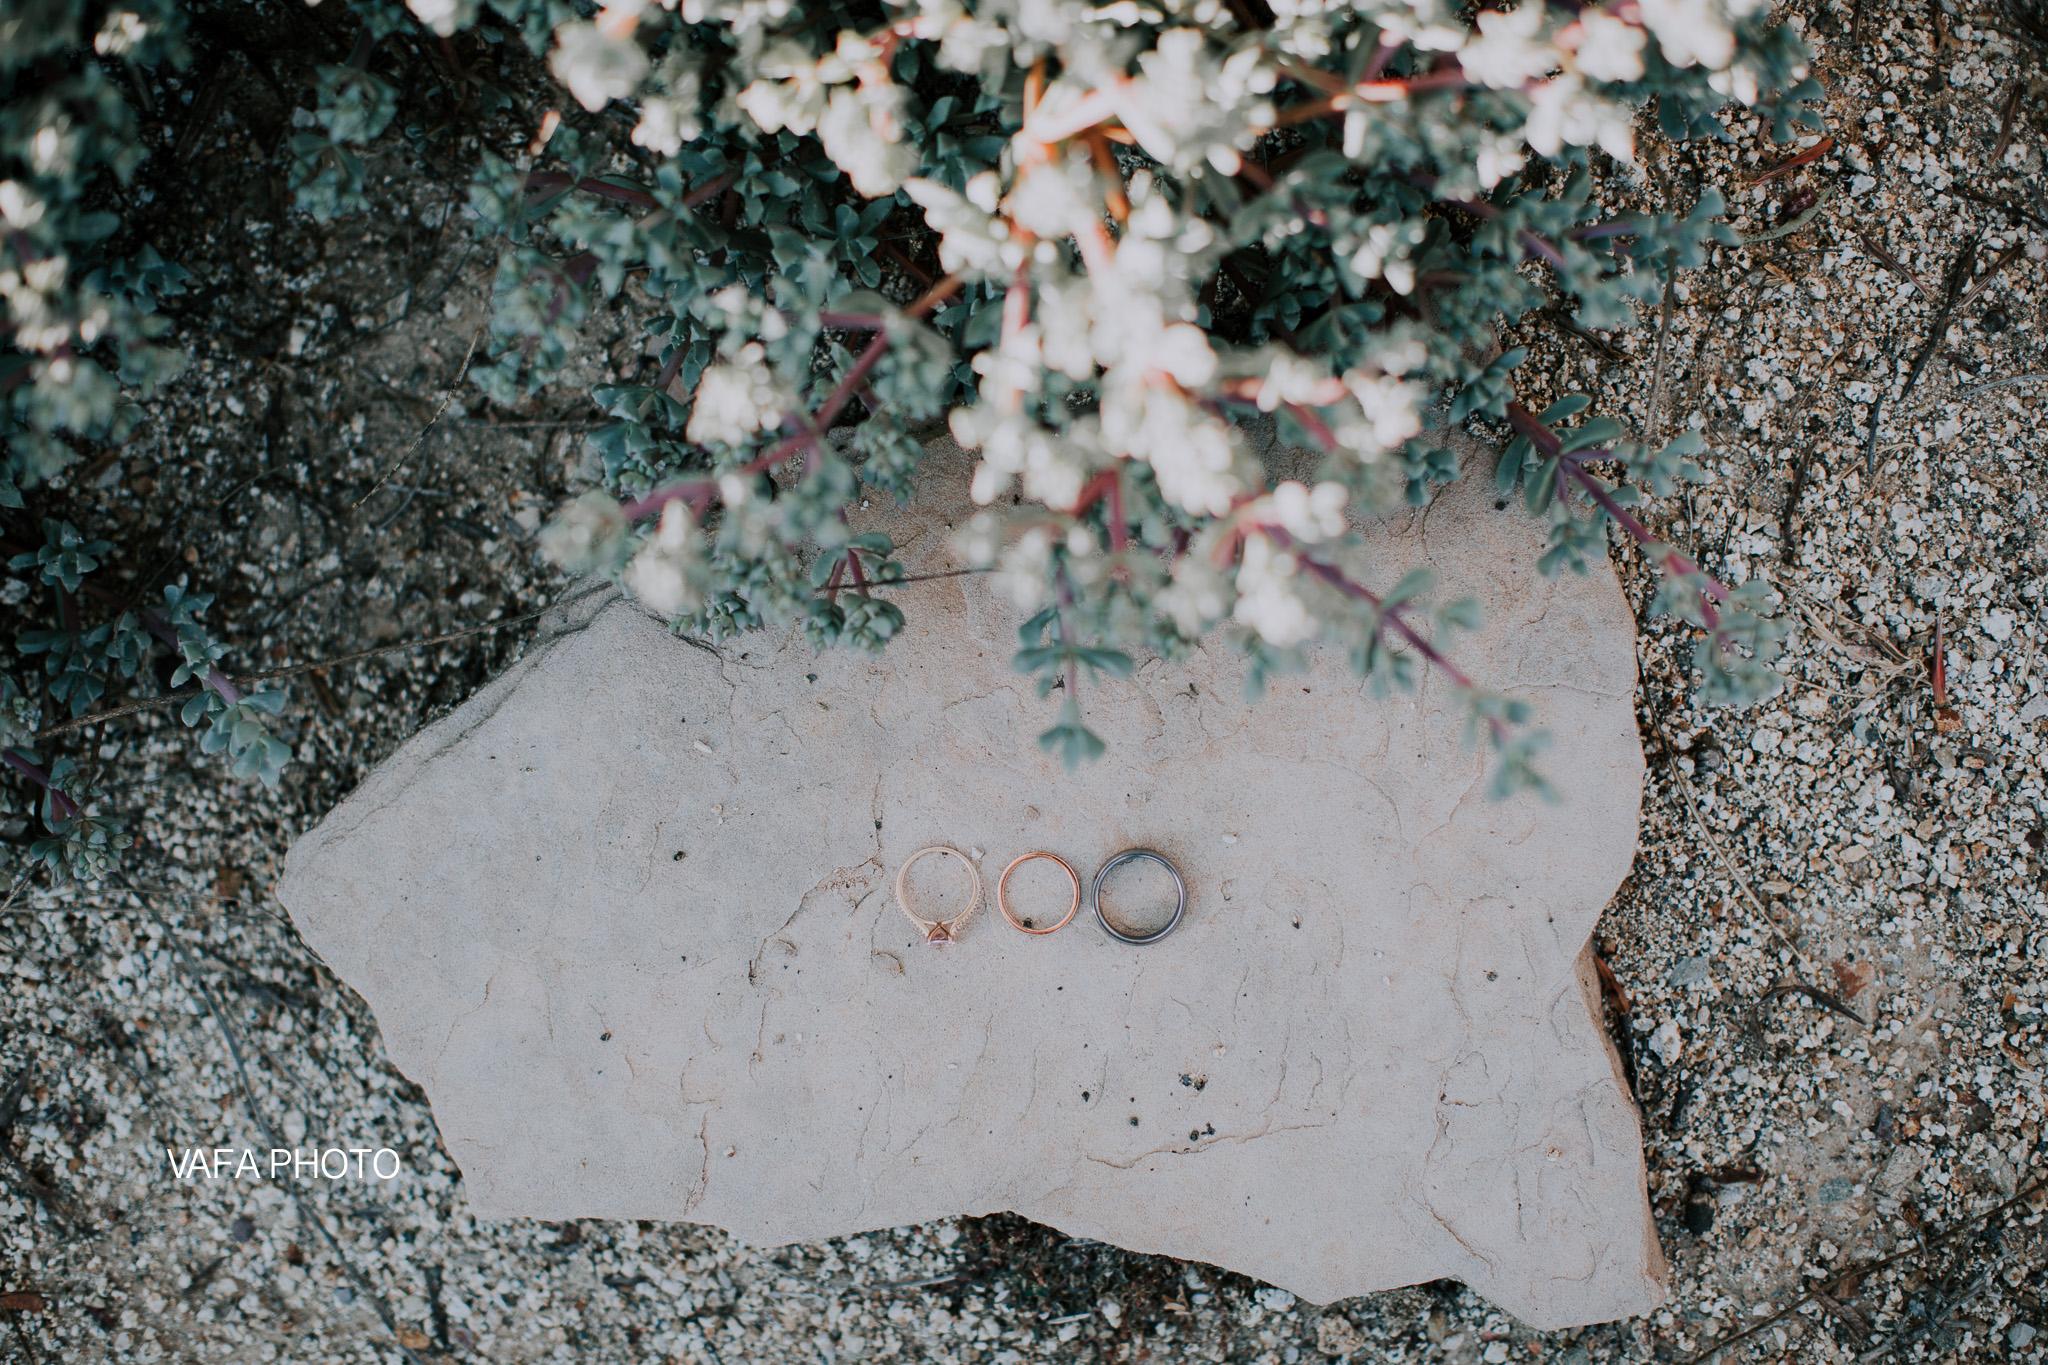 Leo-Carrillo-Ranch-Wedding-Lauren-Mike-Vafa-Photo-814.jpg